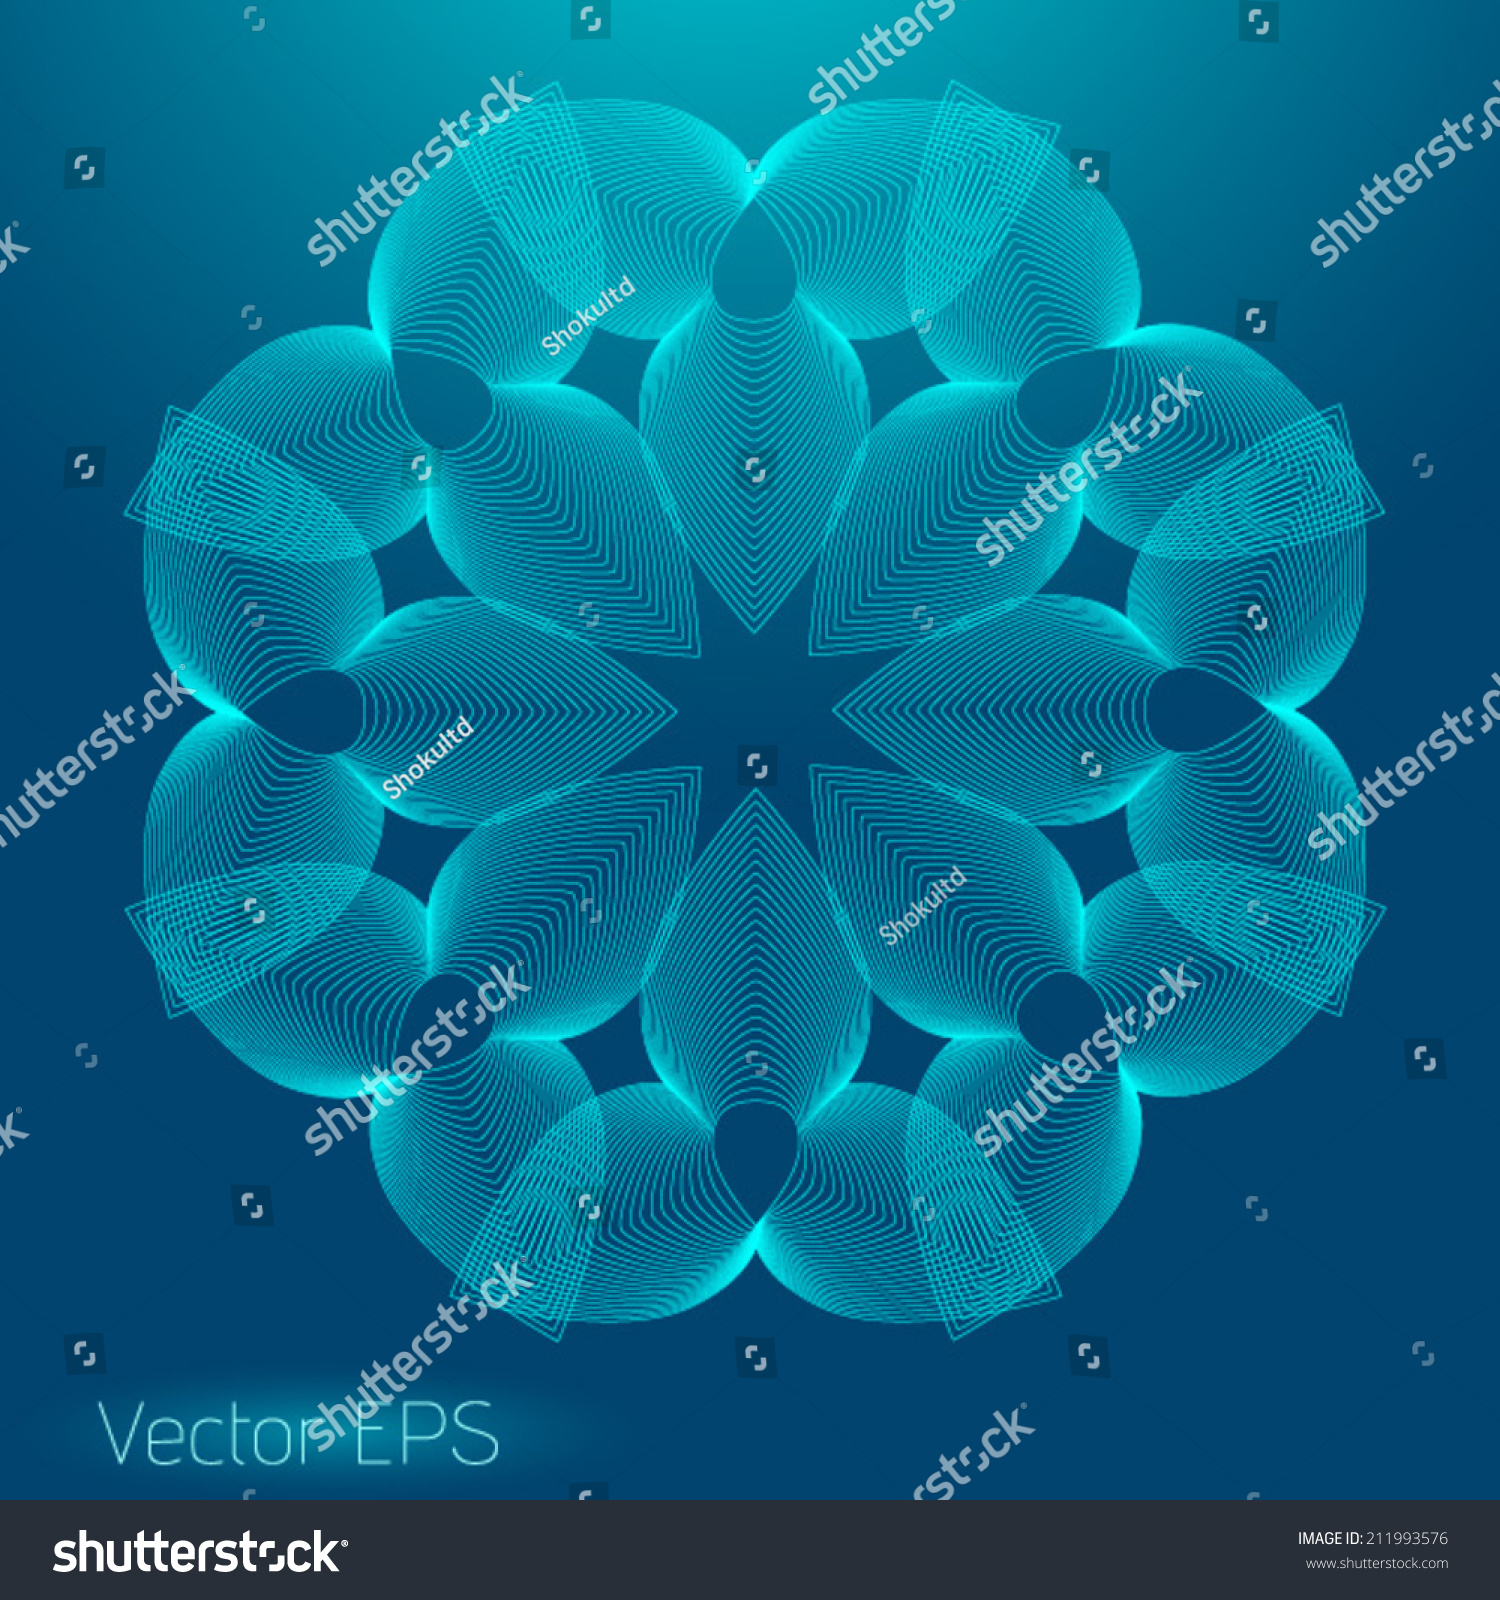 Digital Line Art : Abstract digital line art floral pattern stock vector